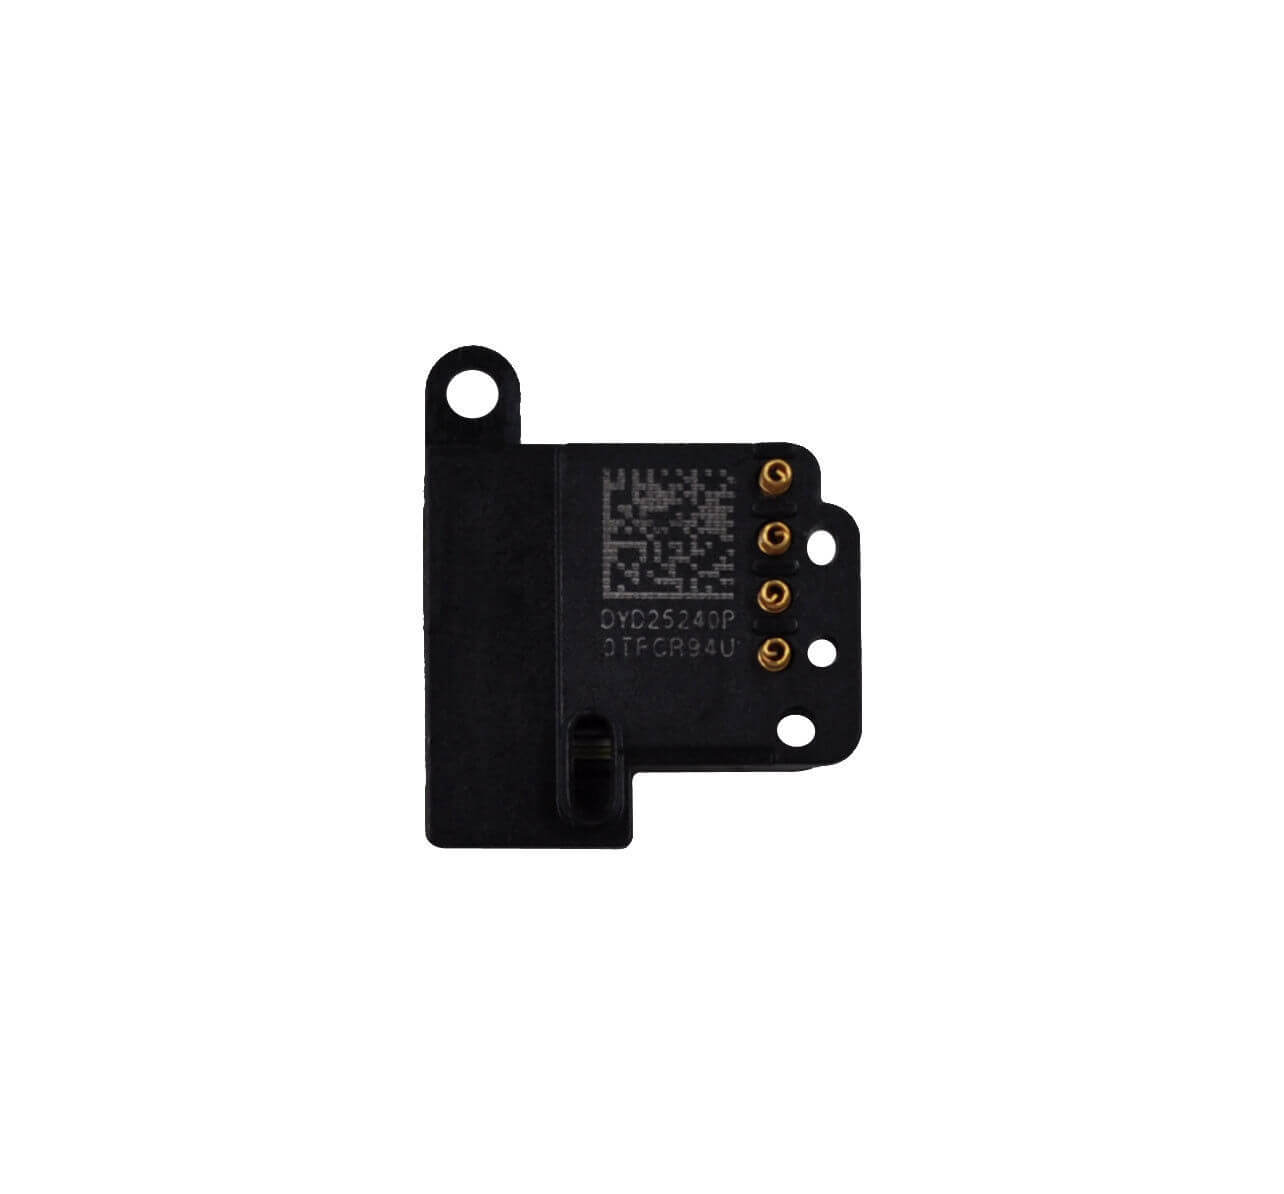 Картинка Динамик (speaker) iPhone 5S/SE от магазина NBS Parts